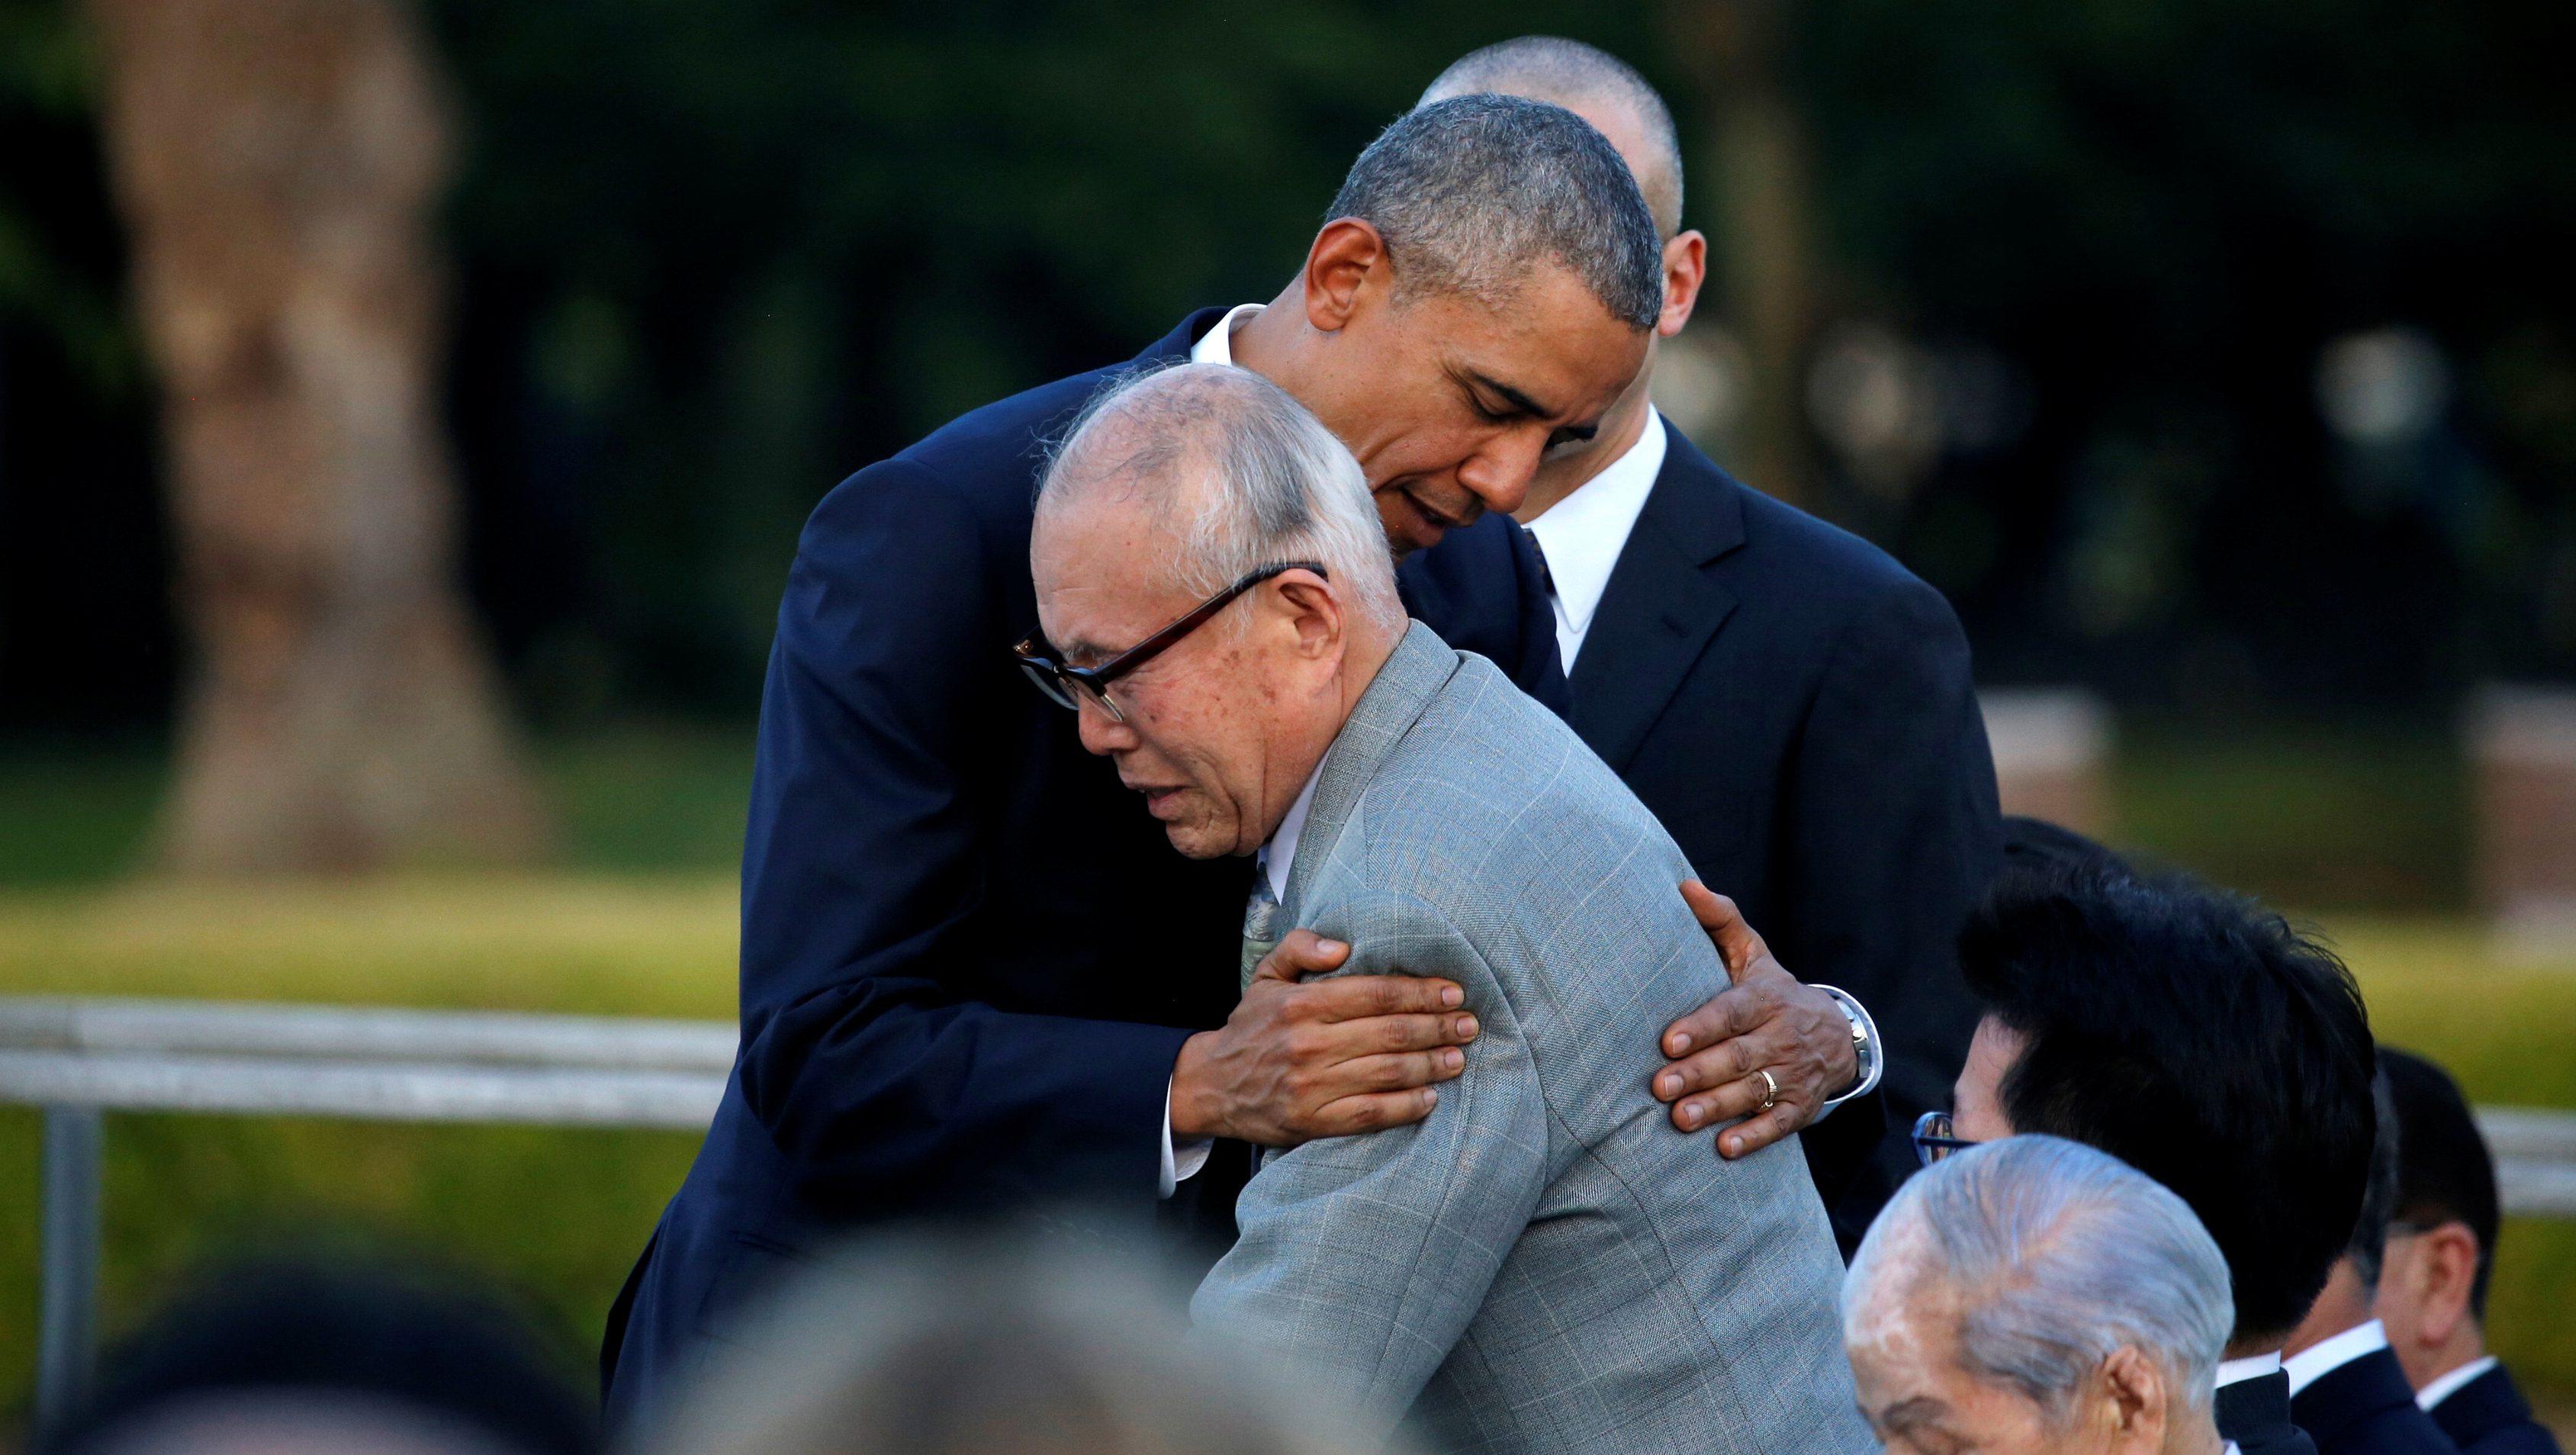 U.S. President Obama hugs atomic bomb survivor Shigeaki Mori as he visits Hiroshima Peace Memorial Park in Hiroshima, Japan